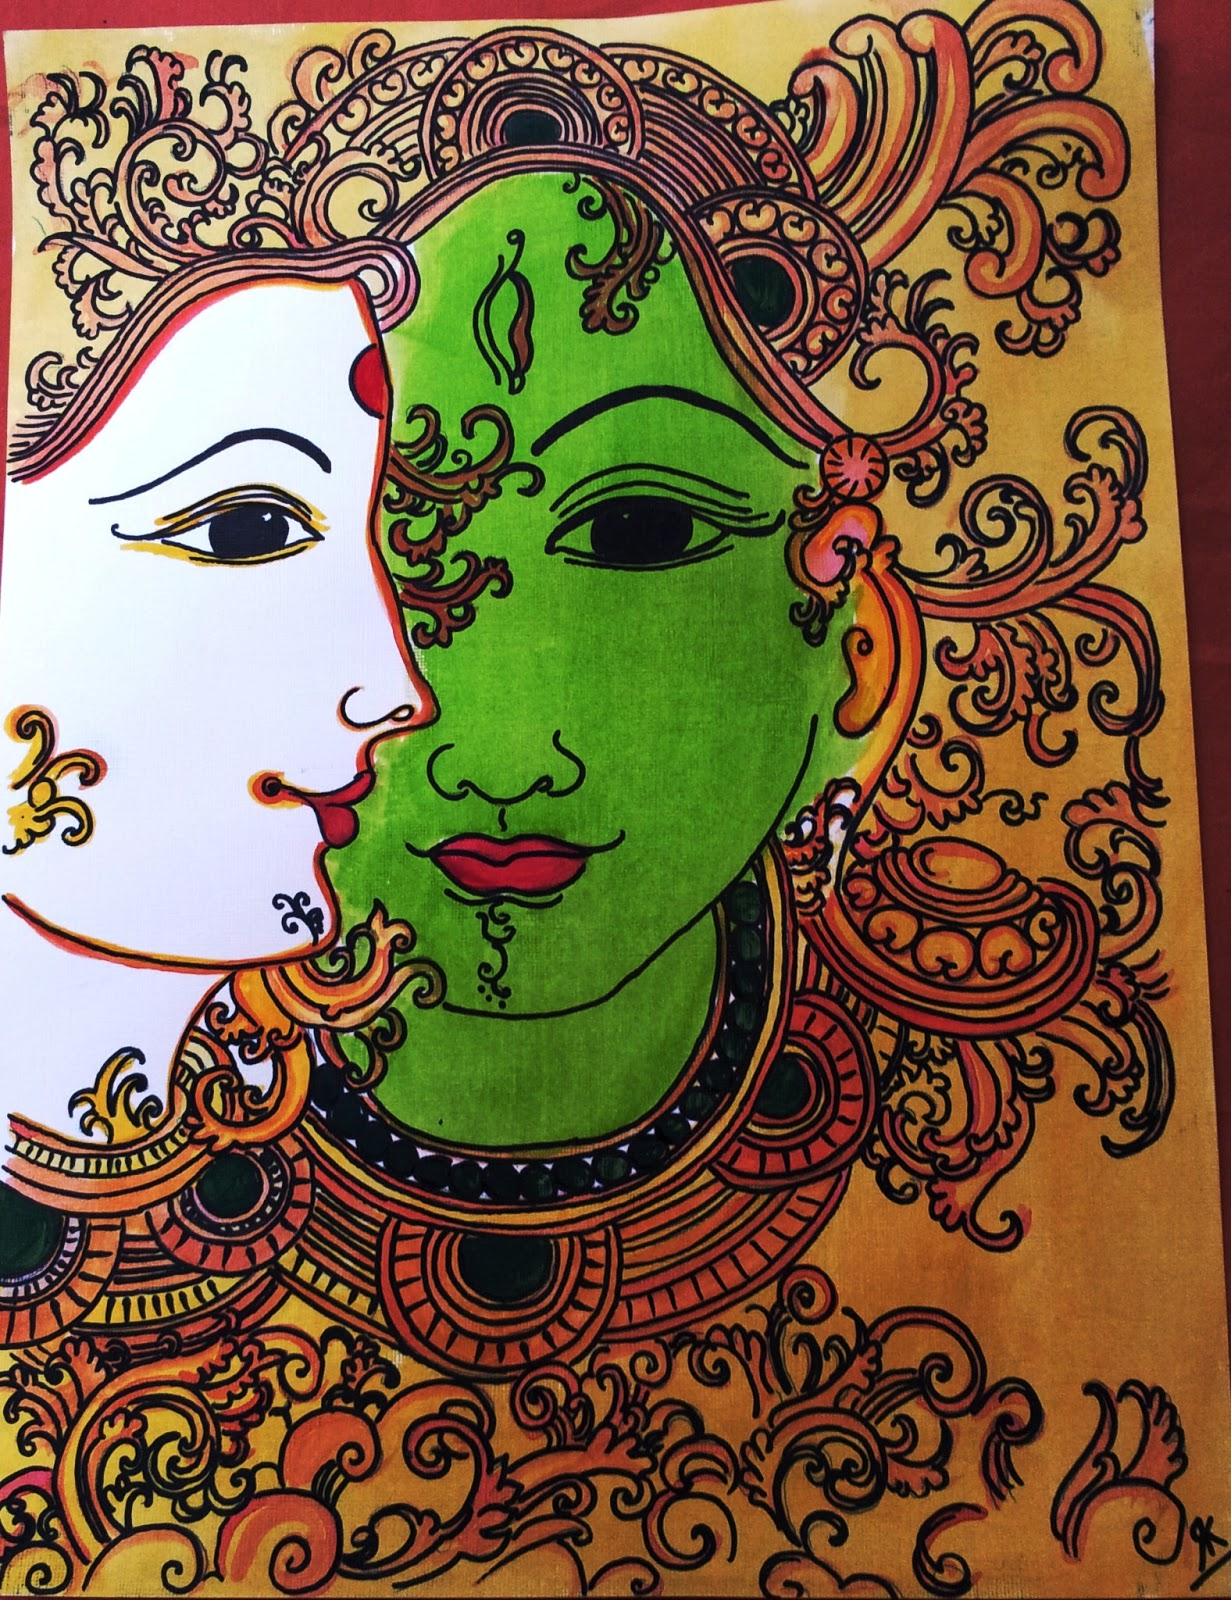 doodles 39 n 39 tangles watercolor mural a mandala. Black Bedroom Furniture Sets. Home Design Ideas